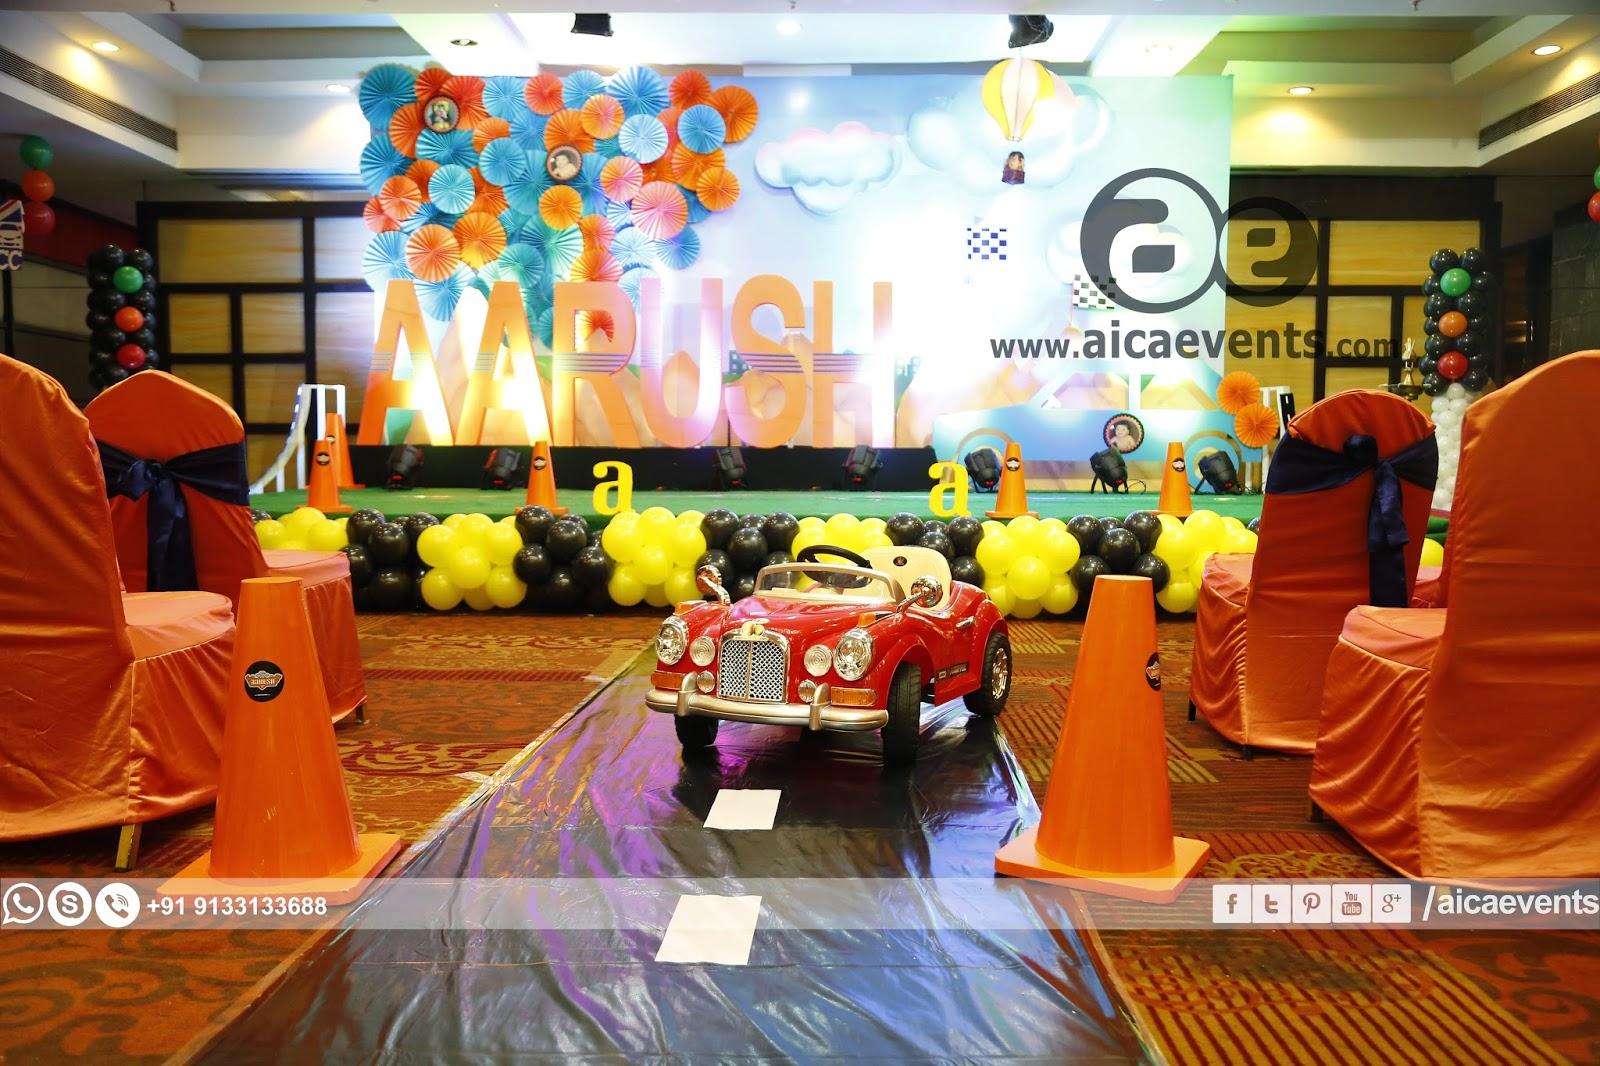 Aicaevents India Aarush 1st Birthday Celebrations